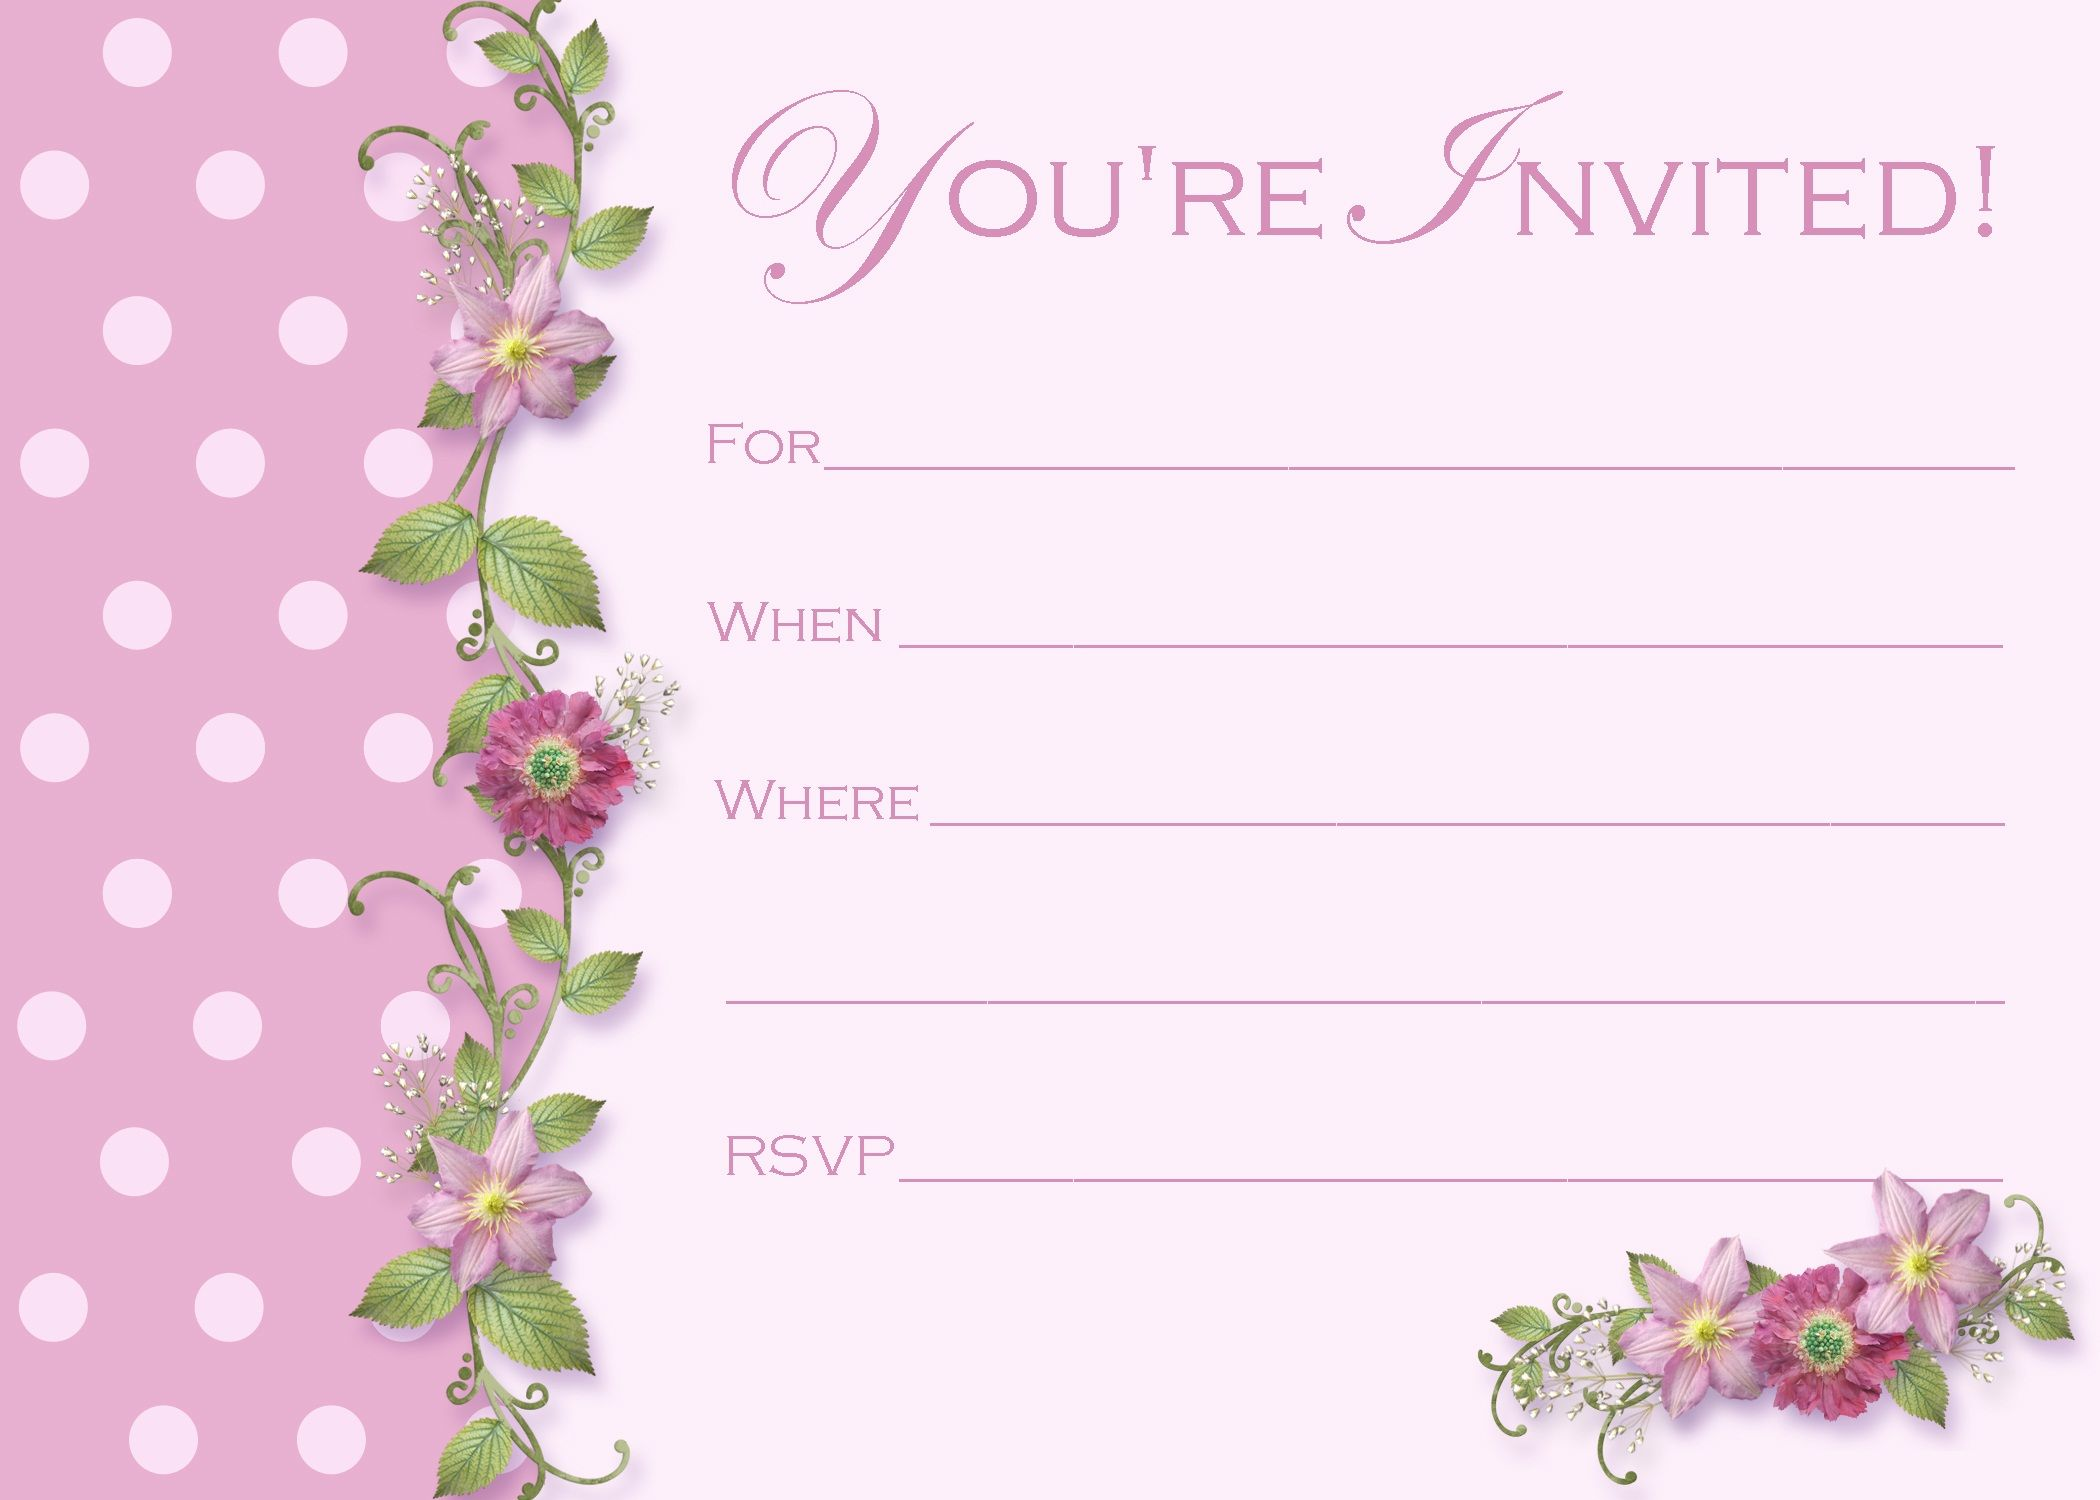 Dinner Invitation Template Blank